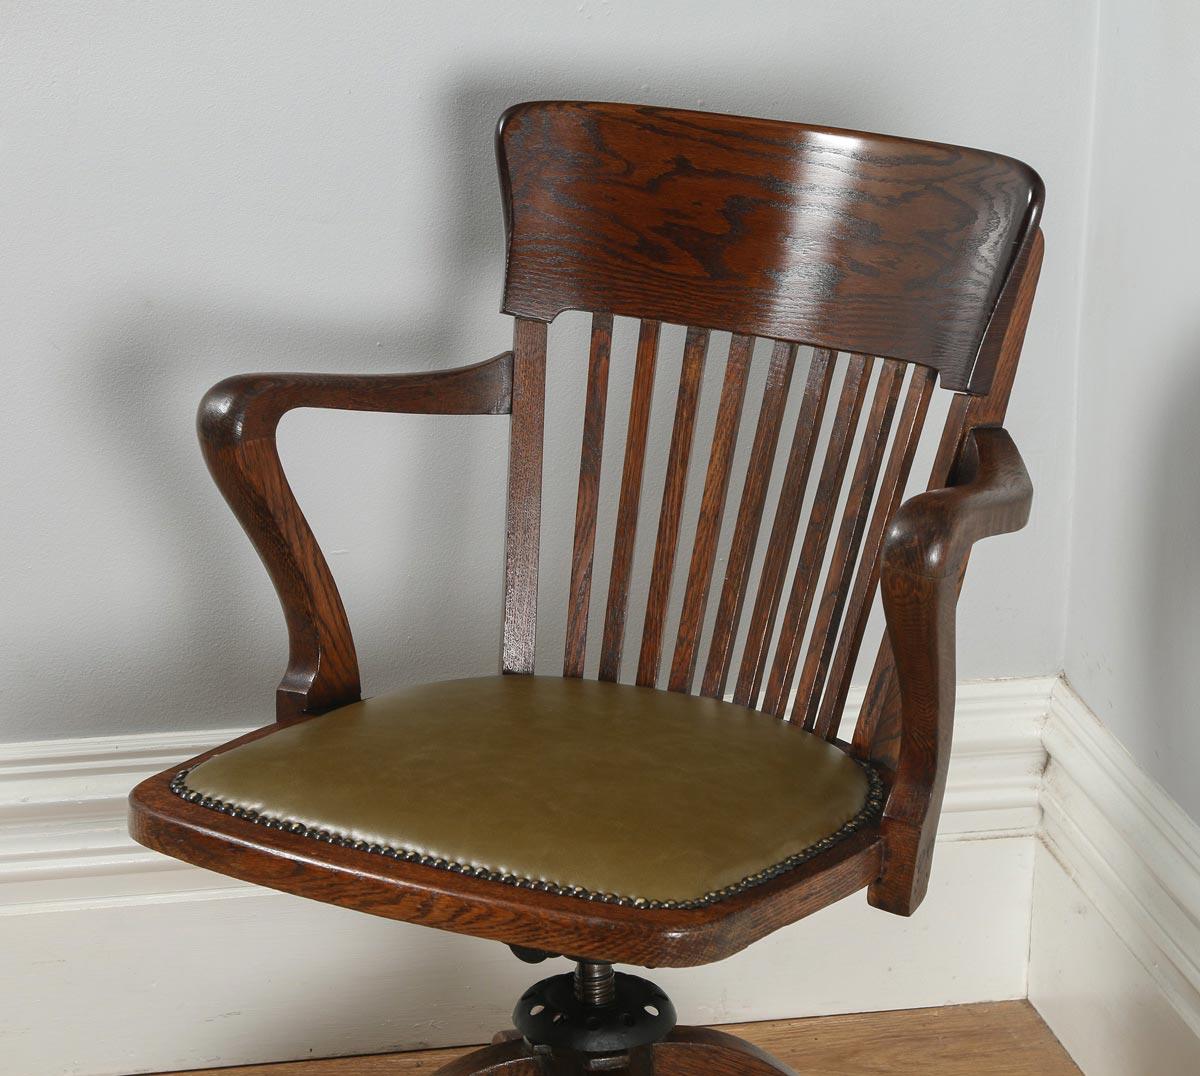 revolving office armchair pub table and chairs 3 piece set 2 antique english edwardian oak desk arm